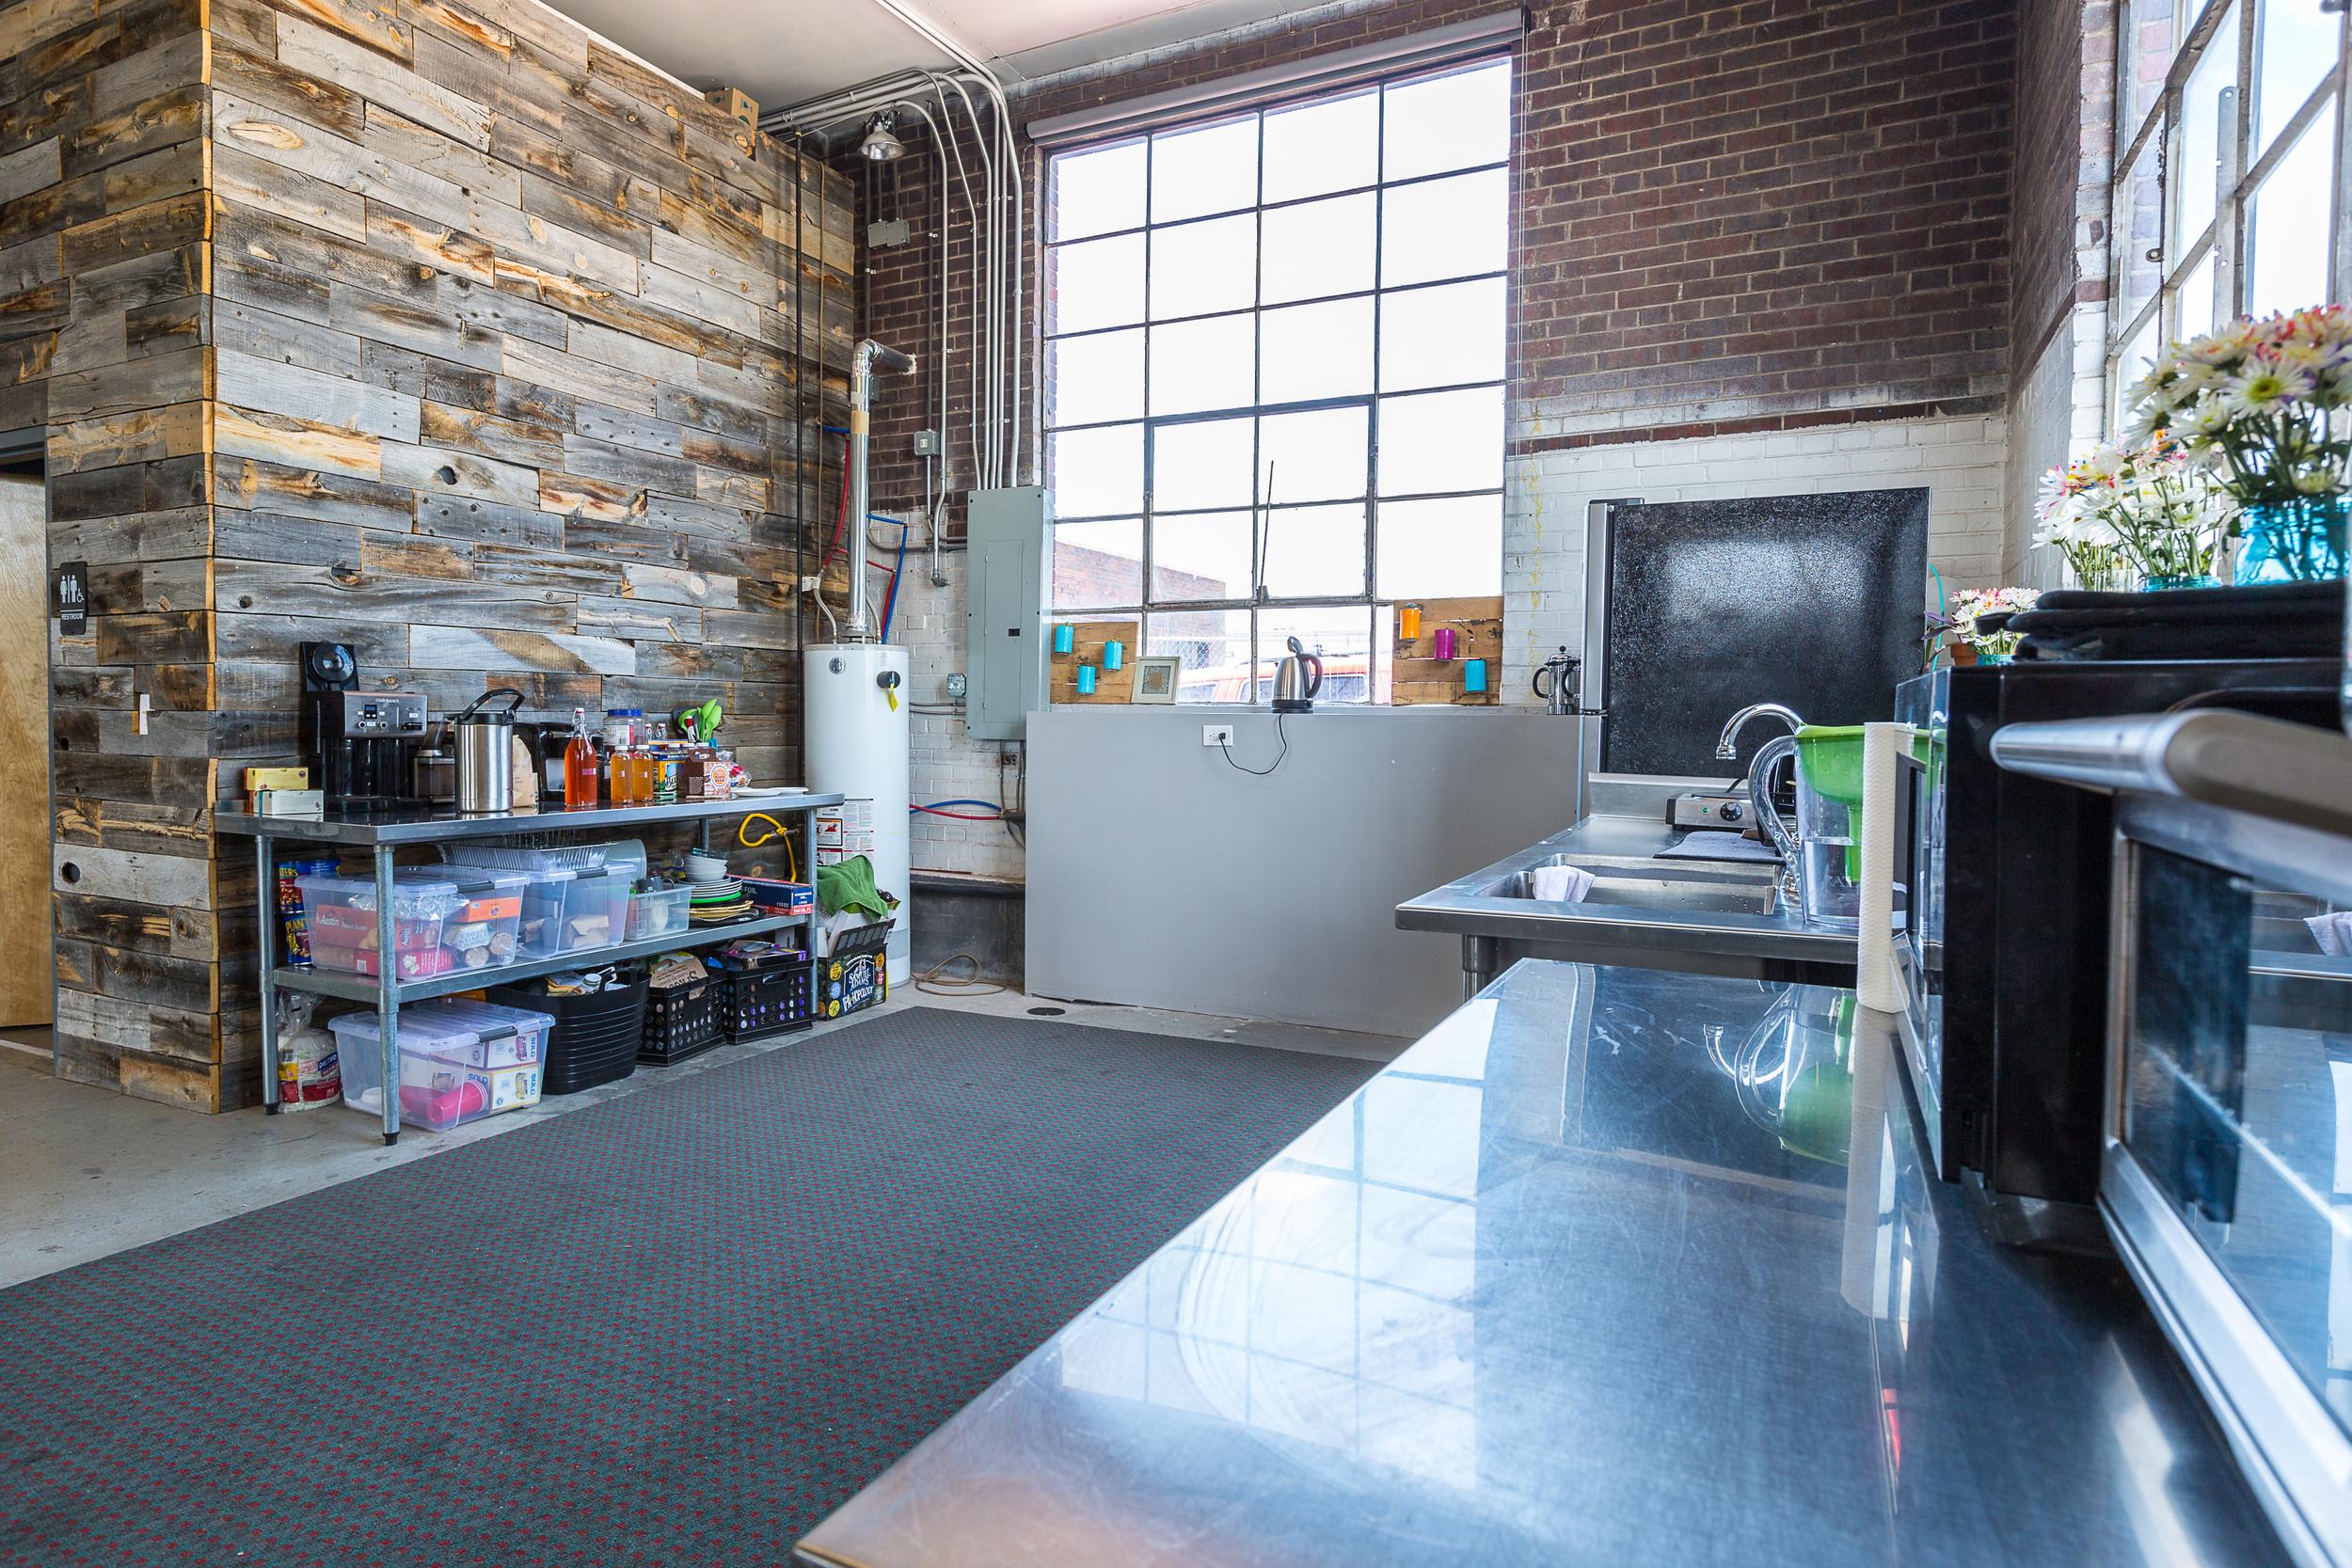 Event Space Kitchen